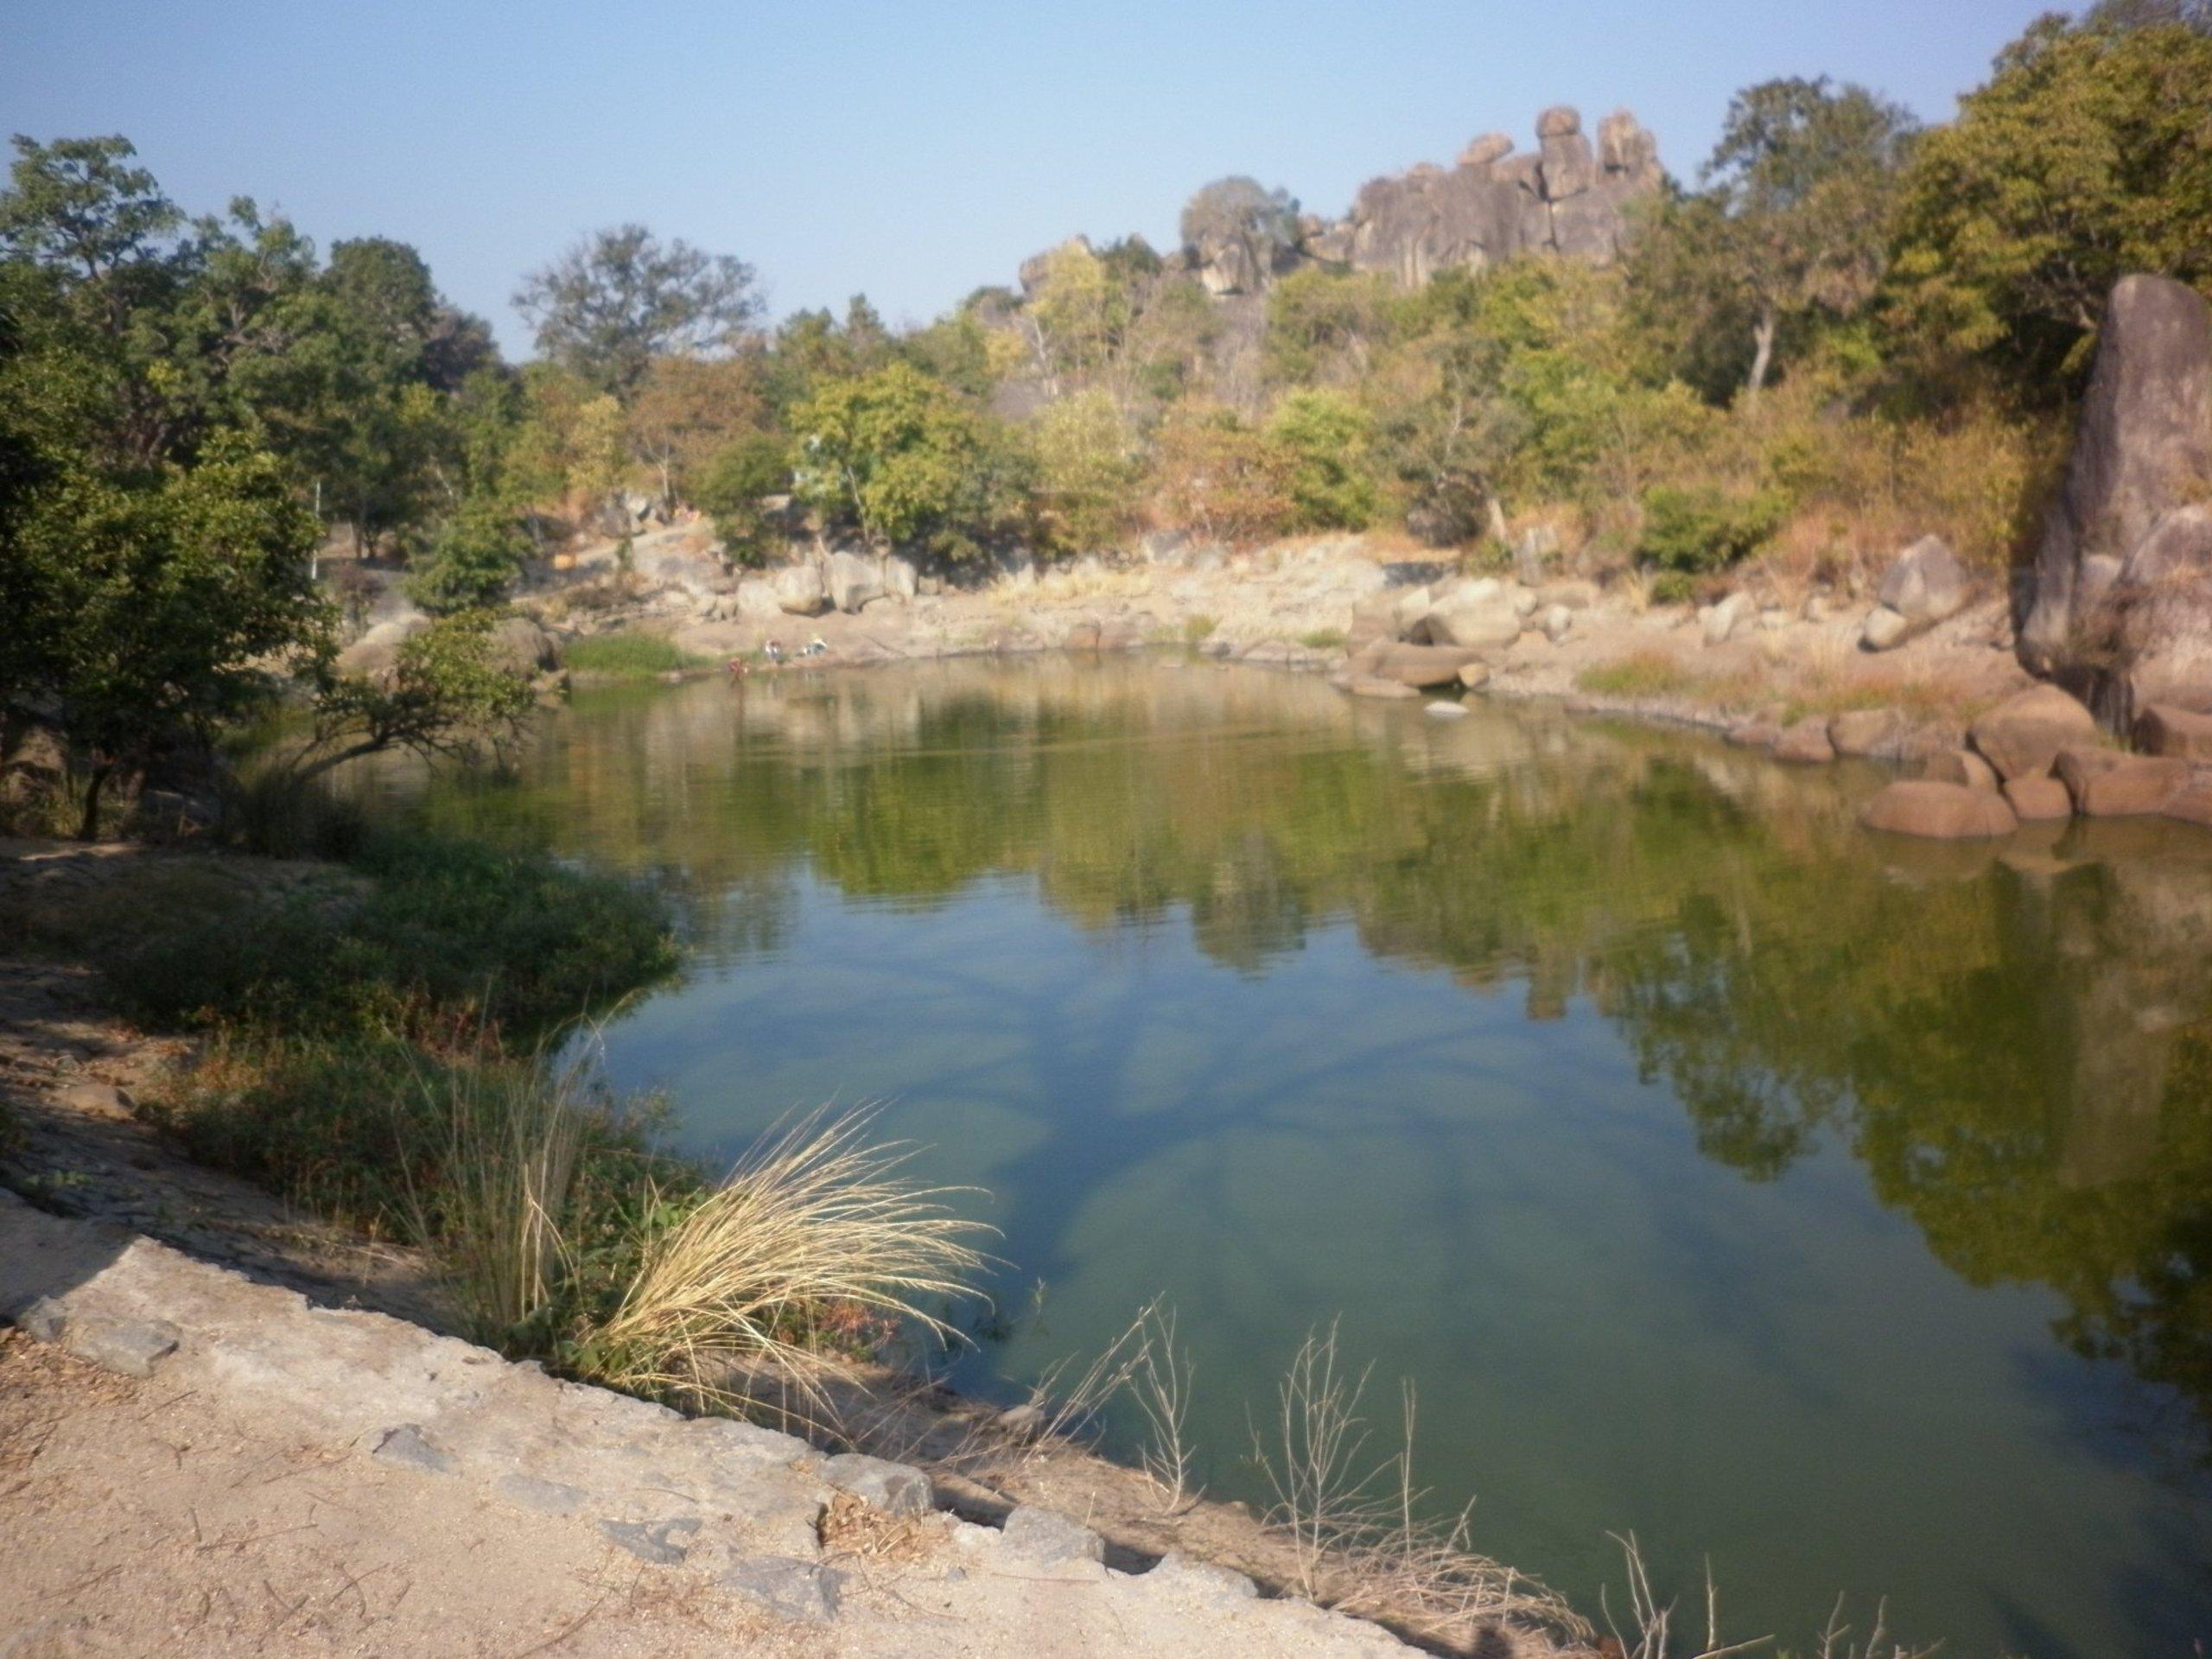 Sight-seeing Historical Place To Visit In Chhattisgarh-Gadiya Mountain